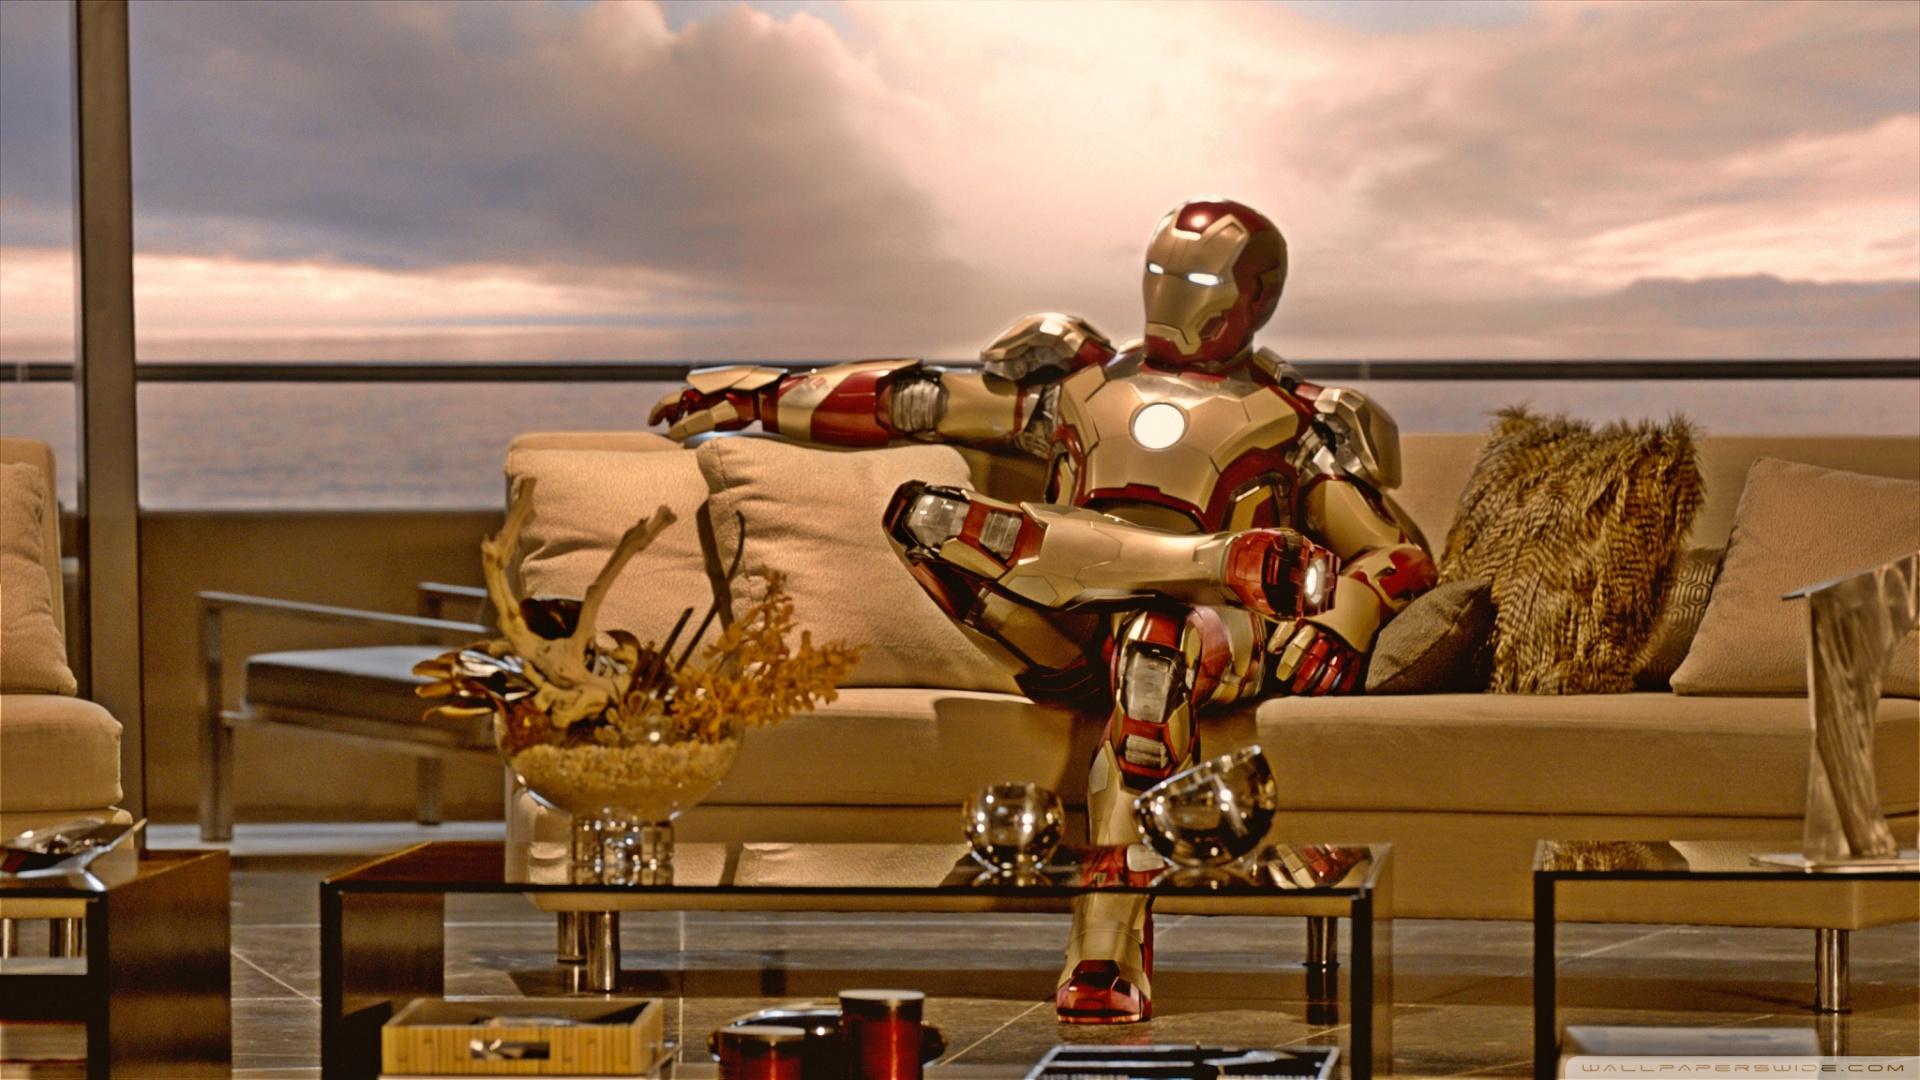 Hd 16 Iron Man 3 Wallpaper Hd 74599 Hd Wallpaper